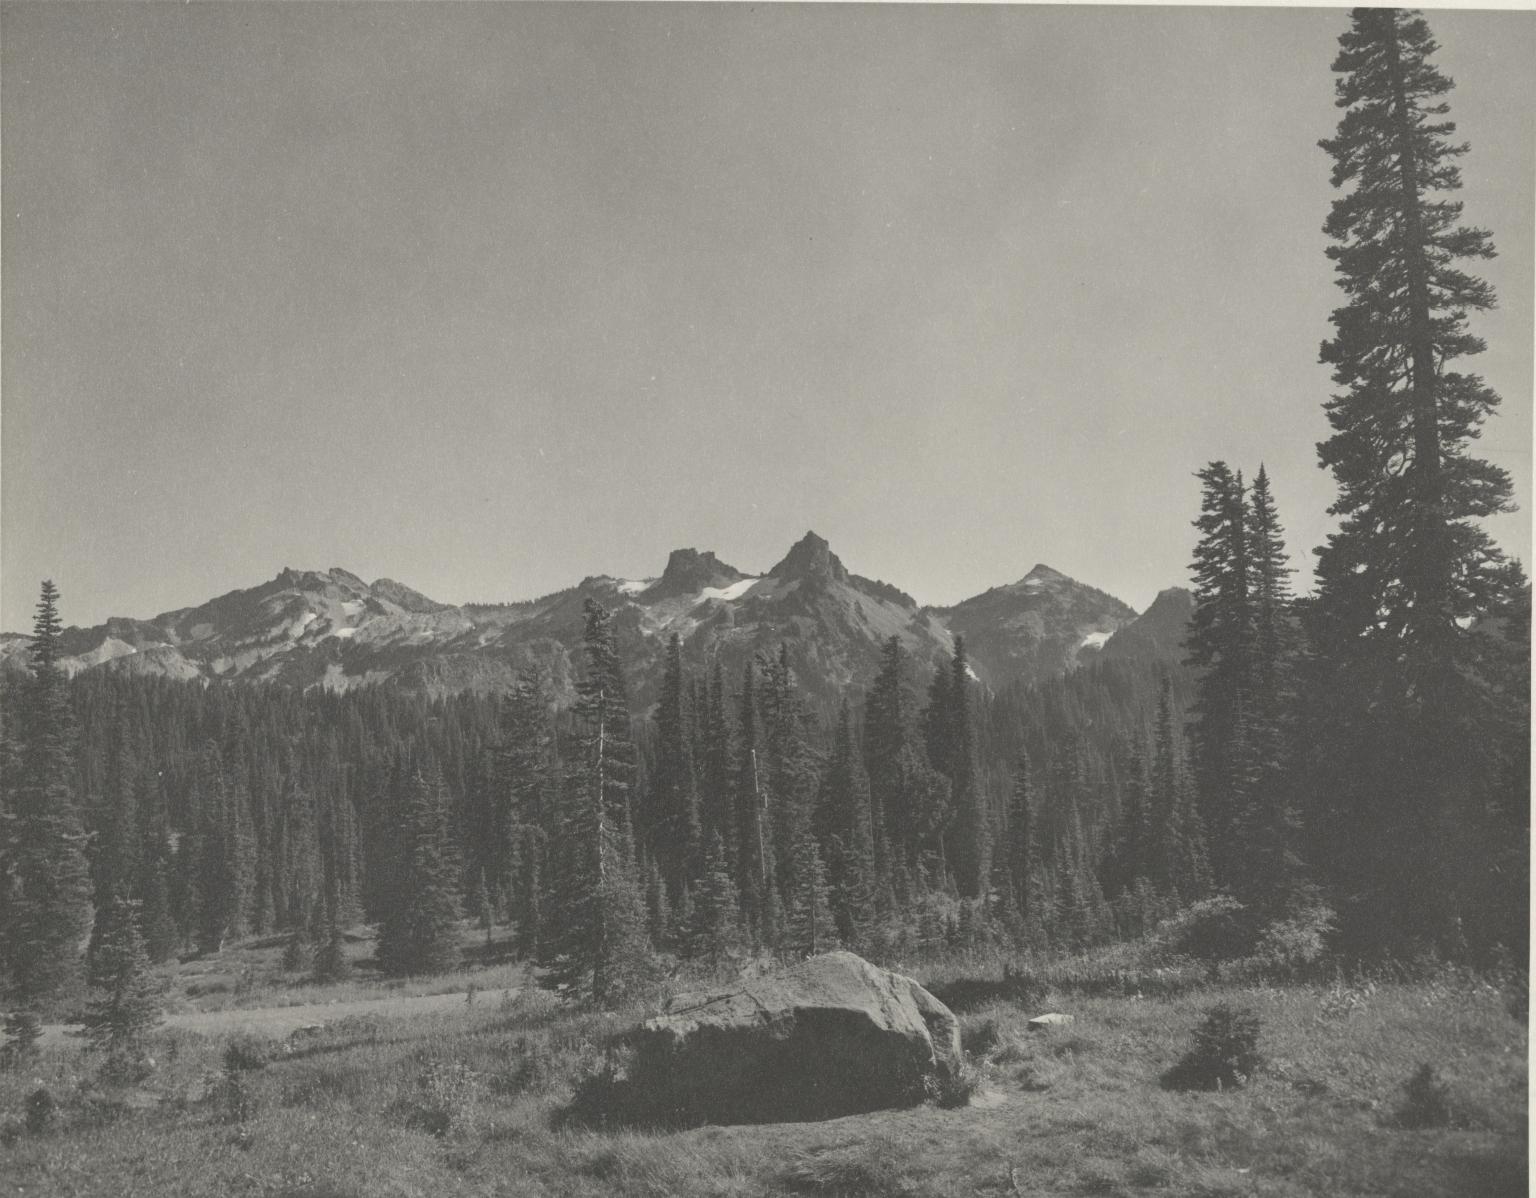 Tatoosh Range from Paradise Inn, Washington